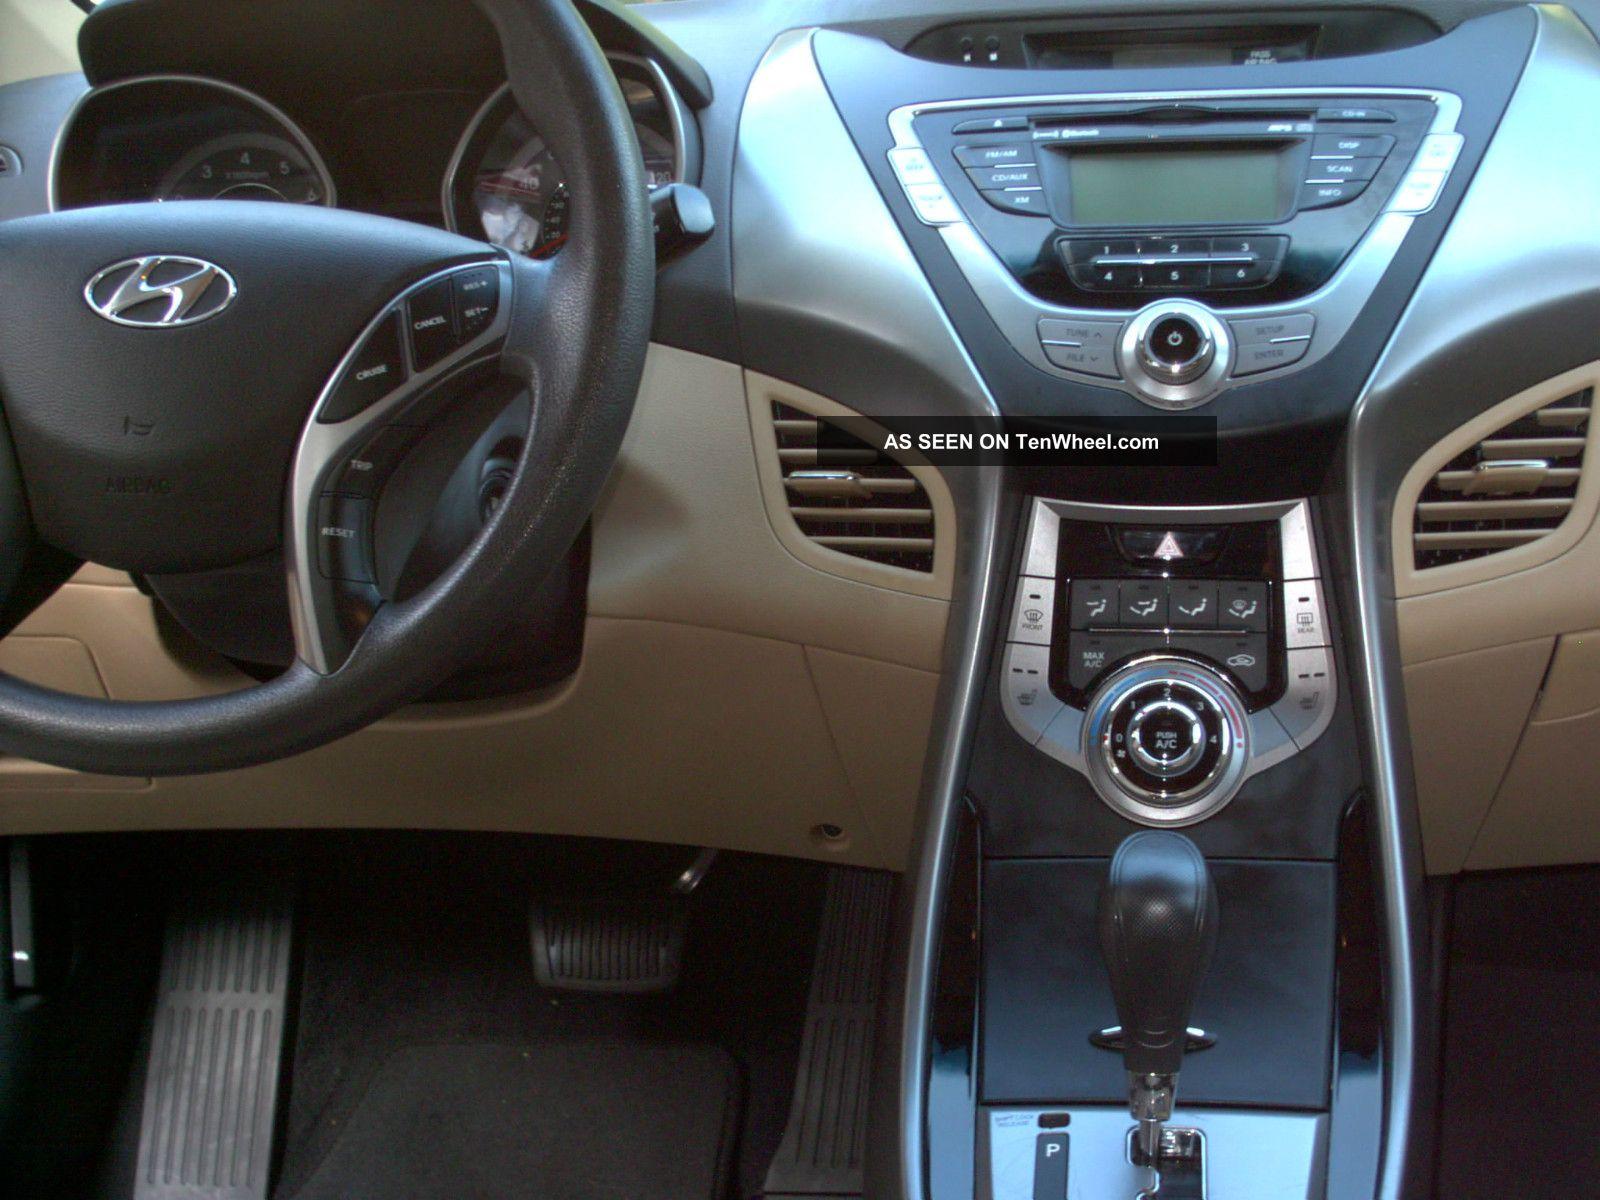 2013 Hyundai Elantra Gls Sedan 4 Door 1 8l